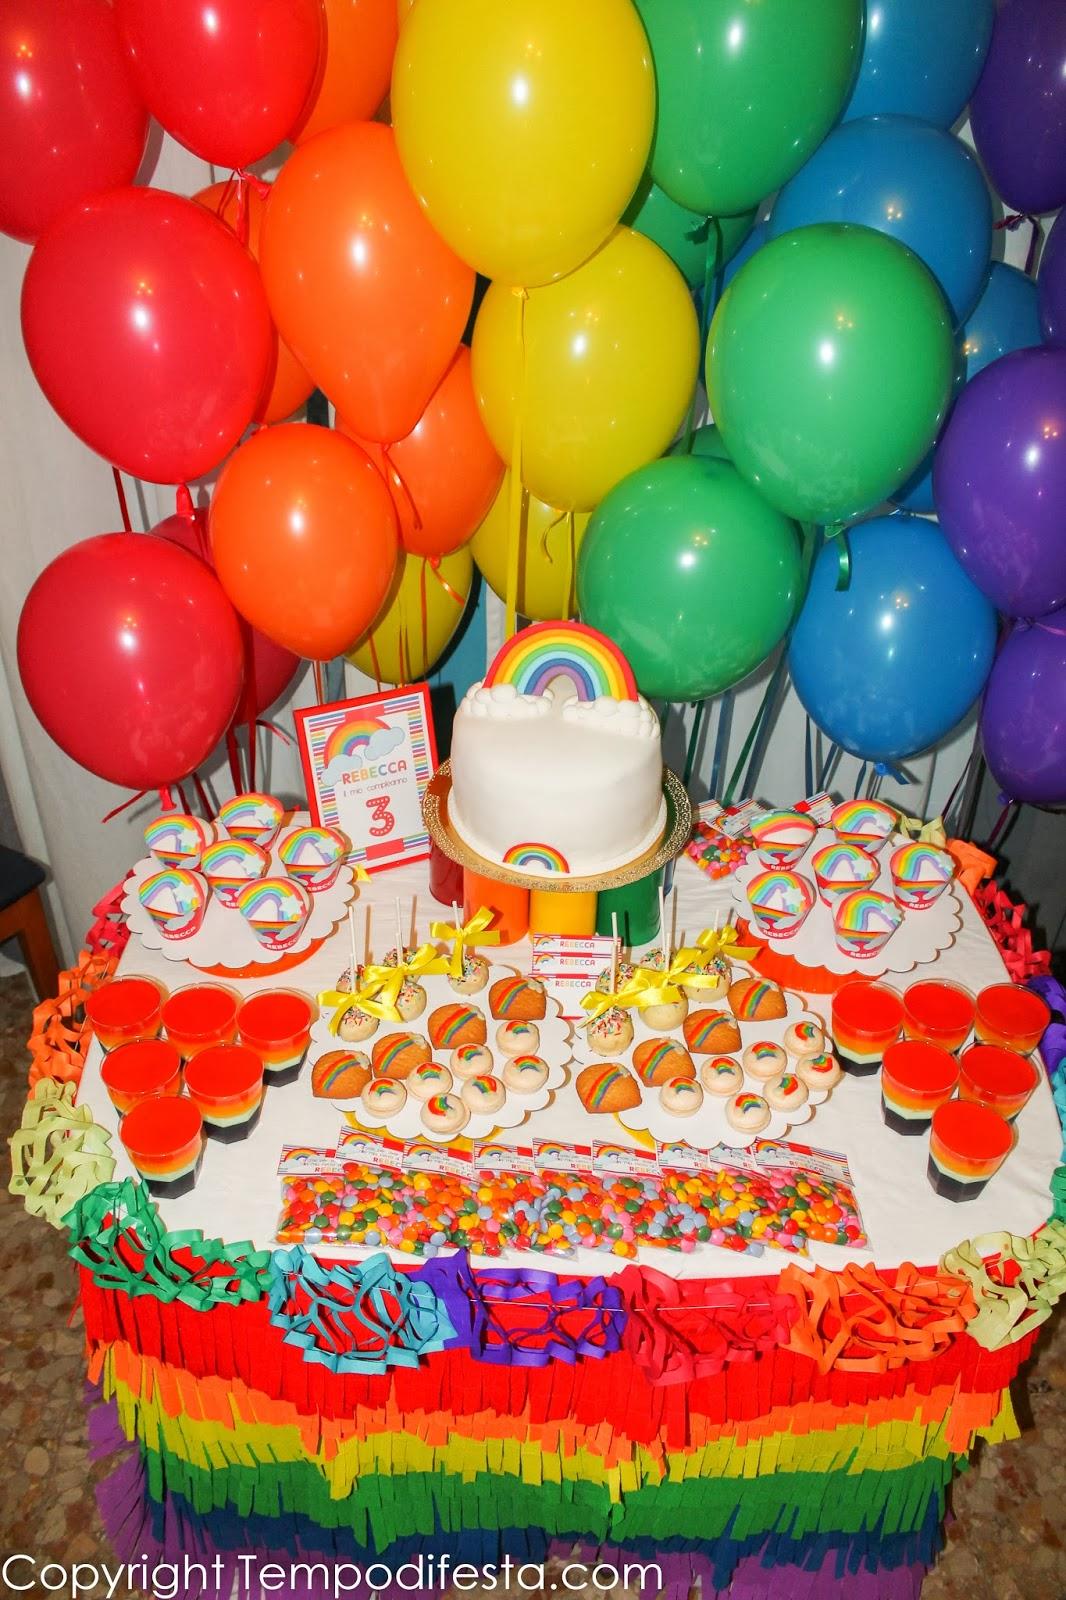 Matrimonio Tema Arcobaleno : Matrimonio tema arcobaleno nx regardsdefemmes